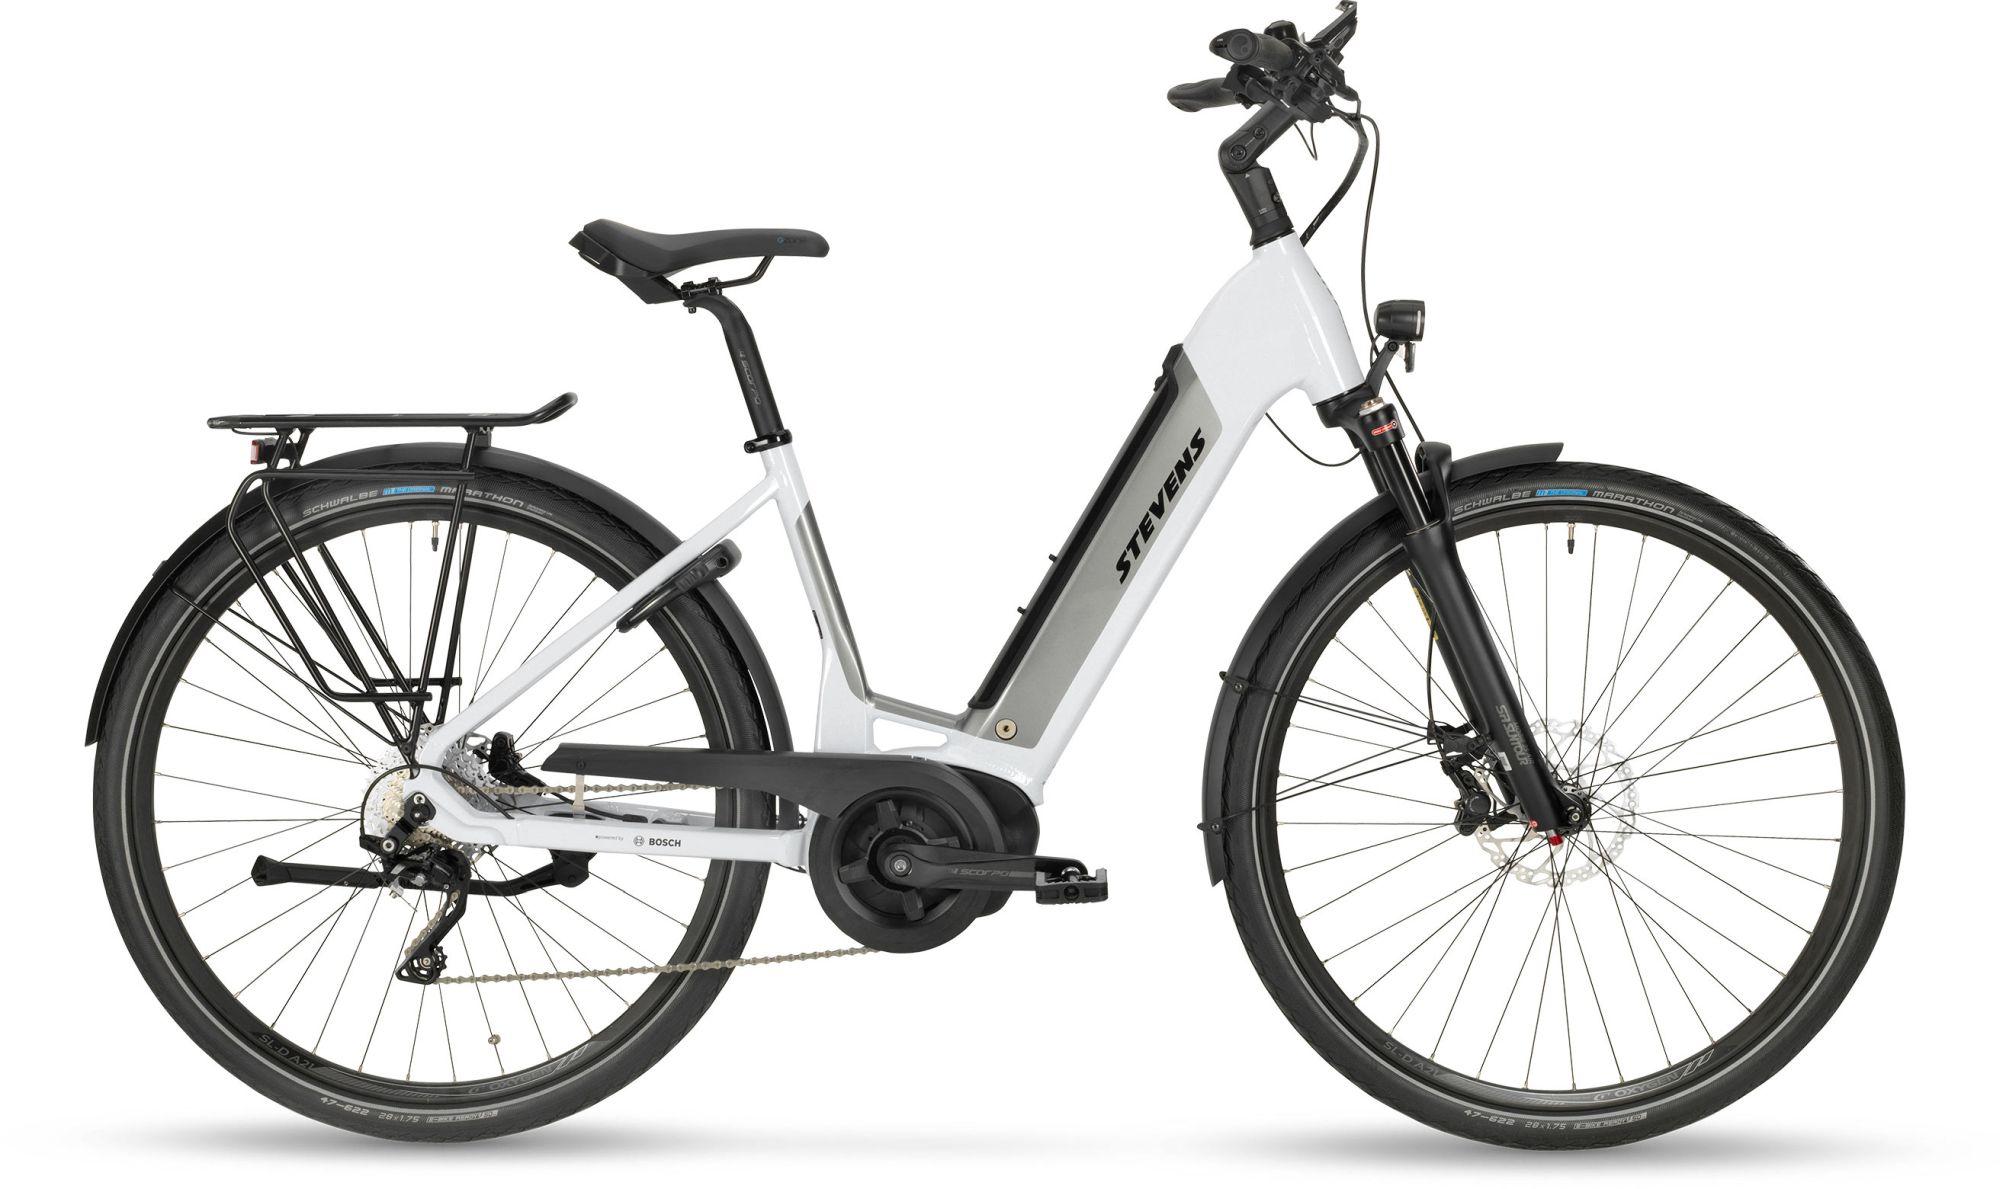 E-Bikes: STEVENS  E-TRITON PT5 Damenfahrrad Wave Modell 2020 28 Zoll 52 cm